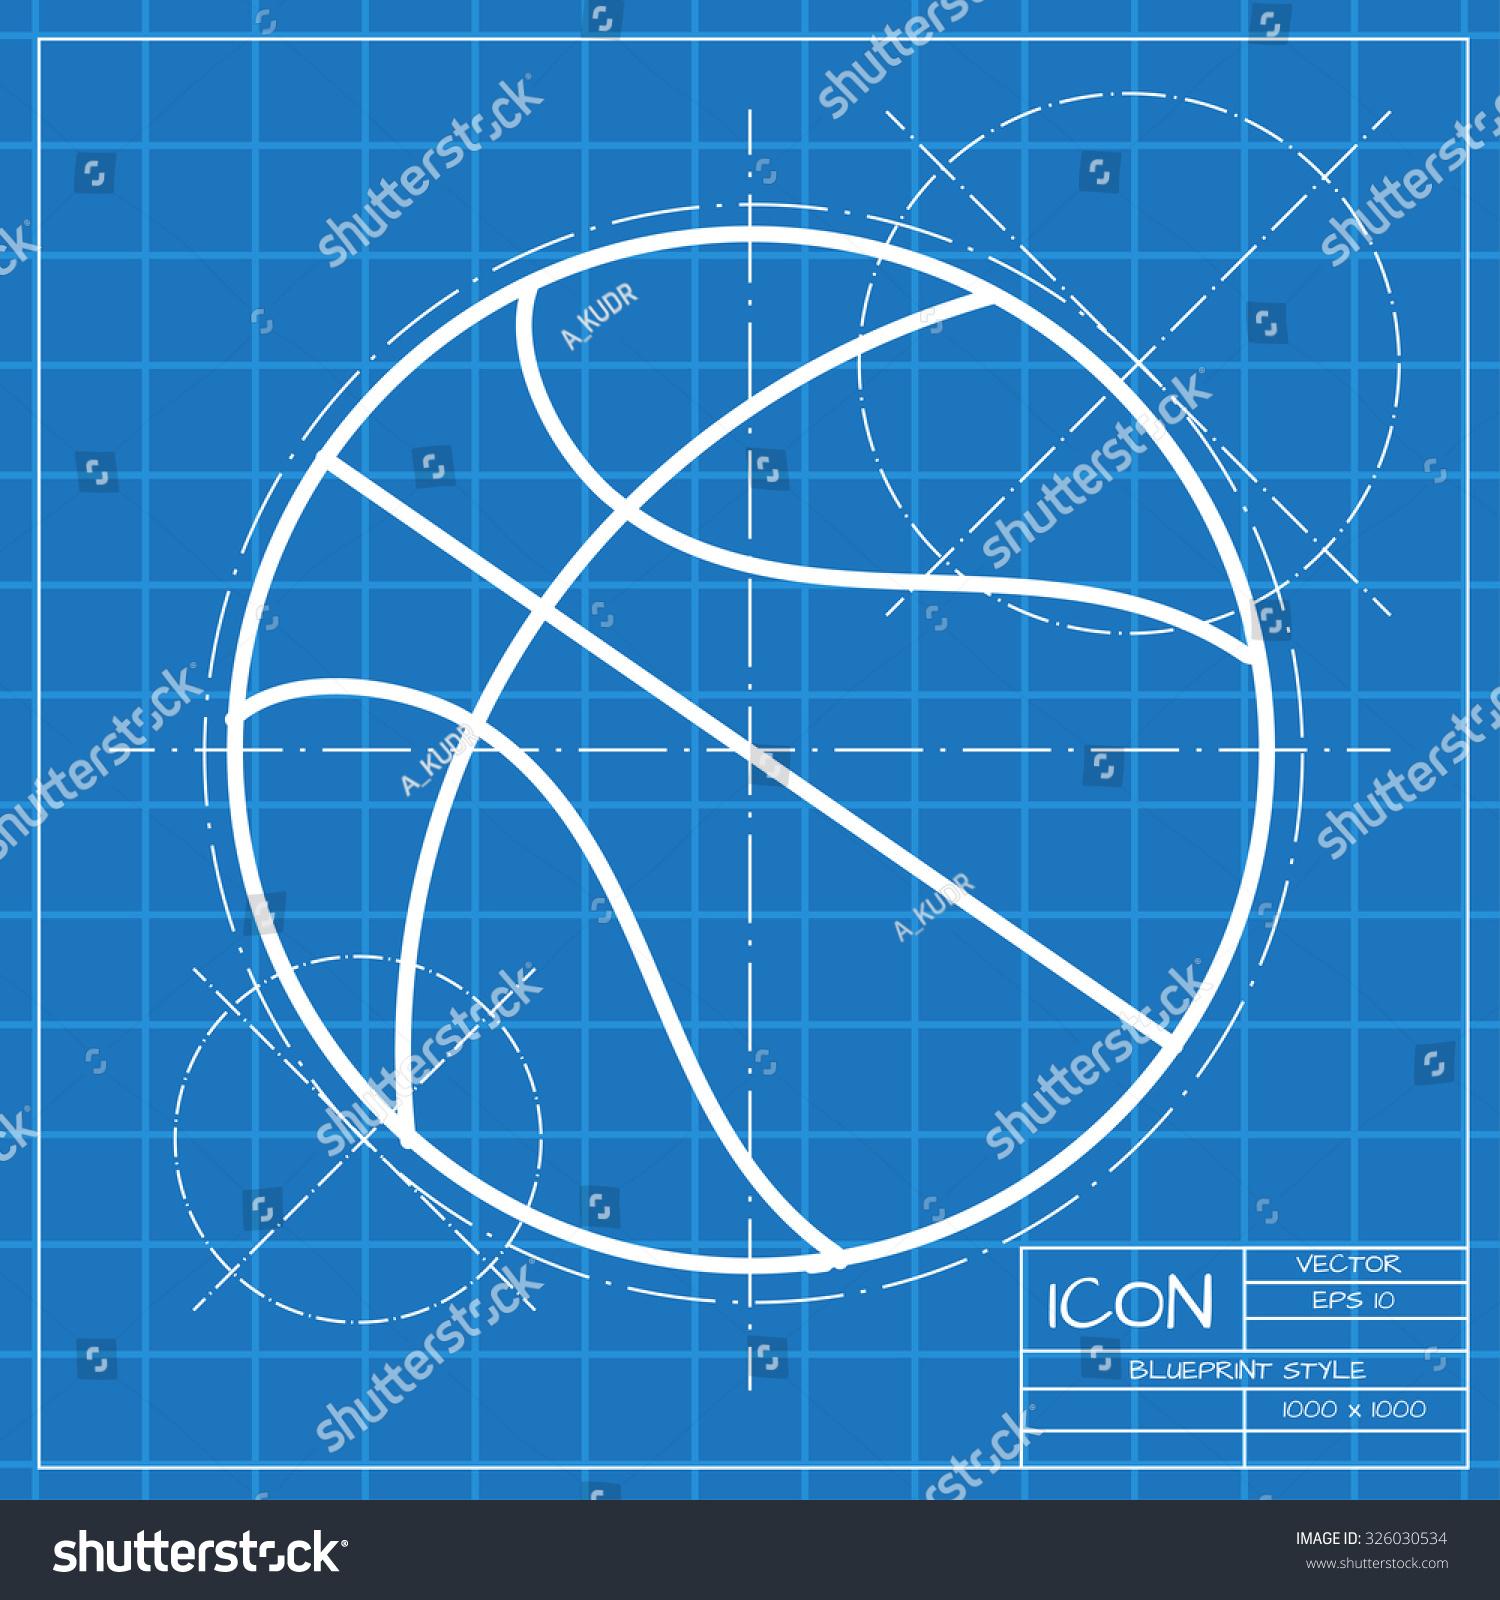 Vector classic blueprint basketball icon on stock vector 2018 vector classic blueprint of basketball icon on engineer and architect background malvernweather Choice Image